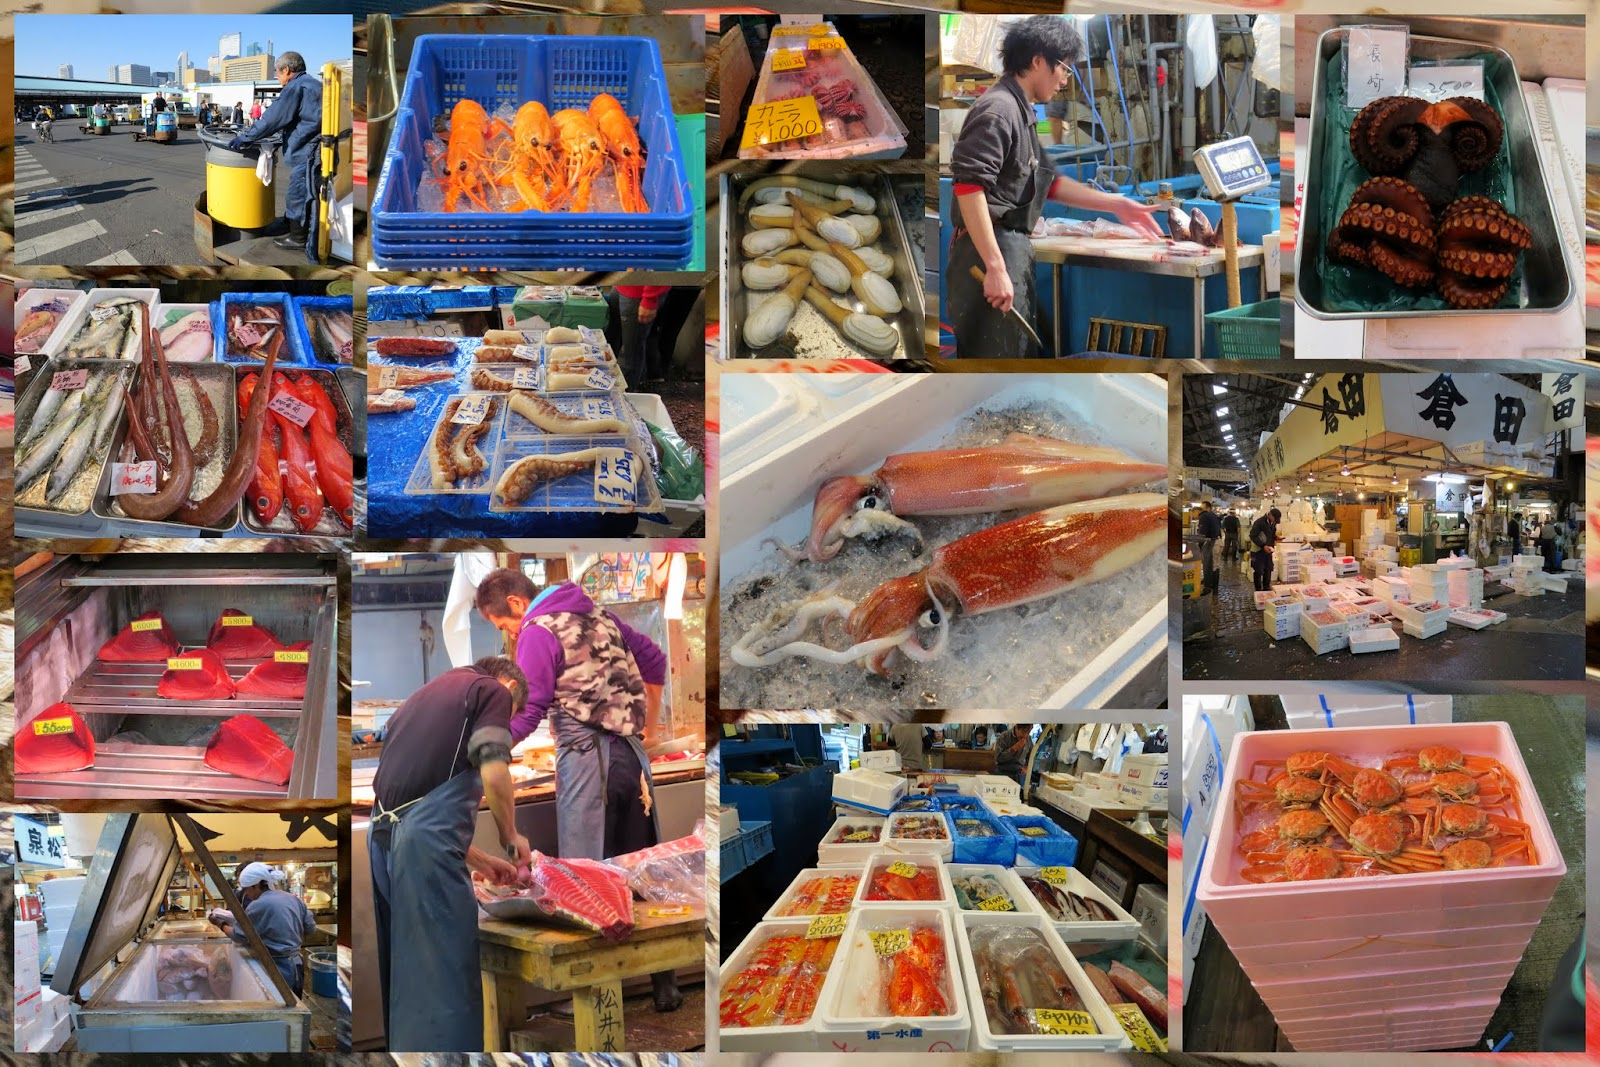 Areas of Tokyo City: Tsukiji Fish Market